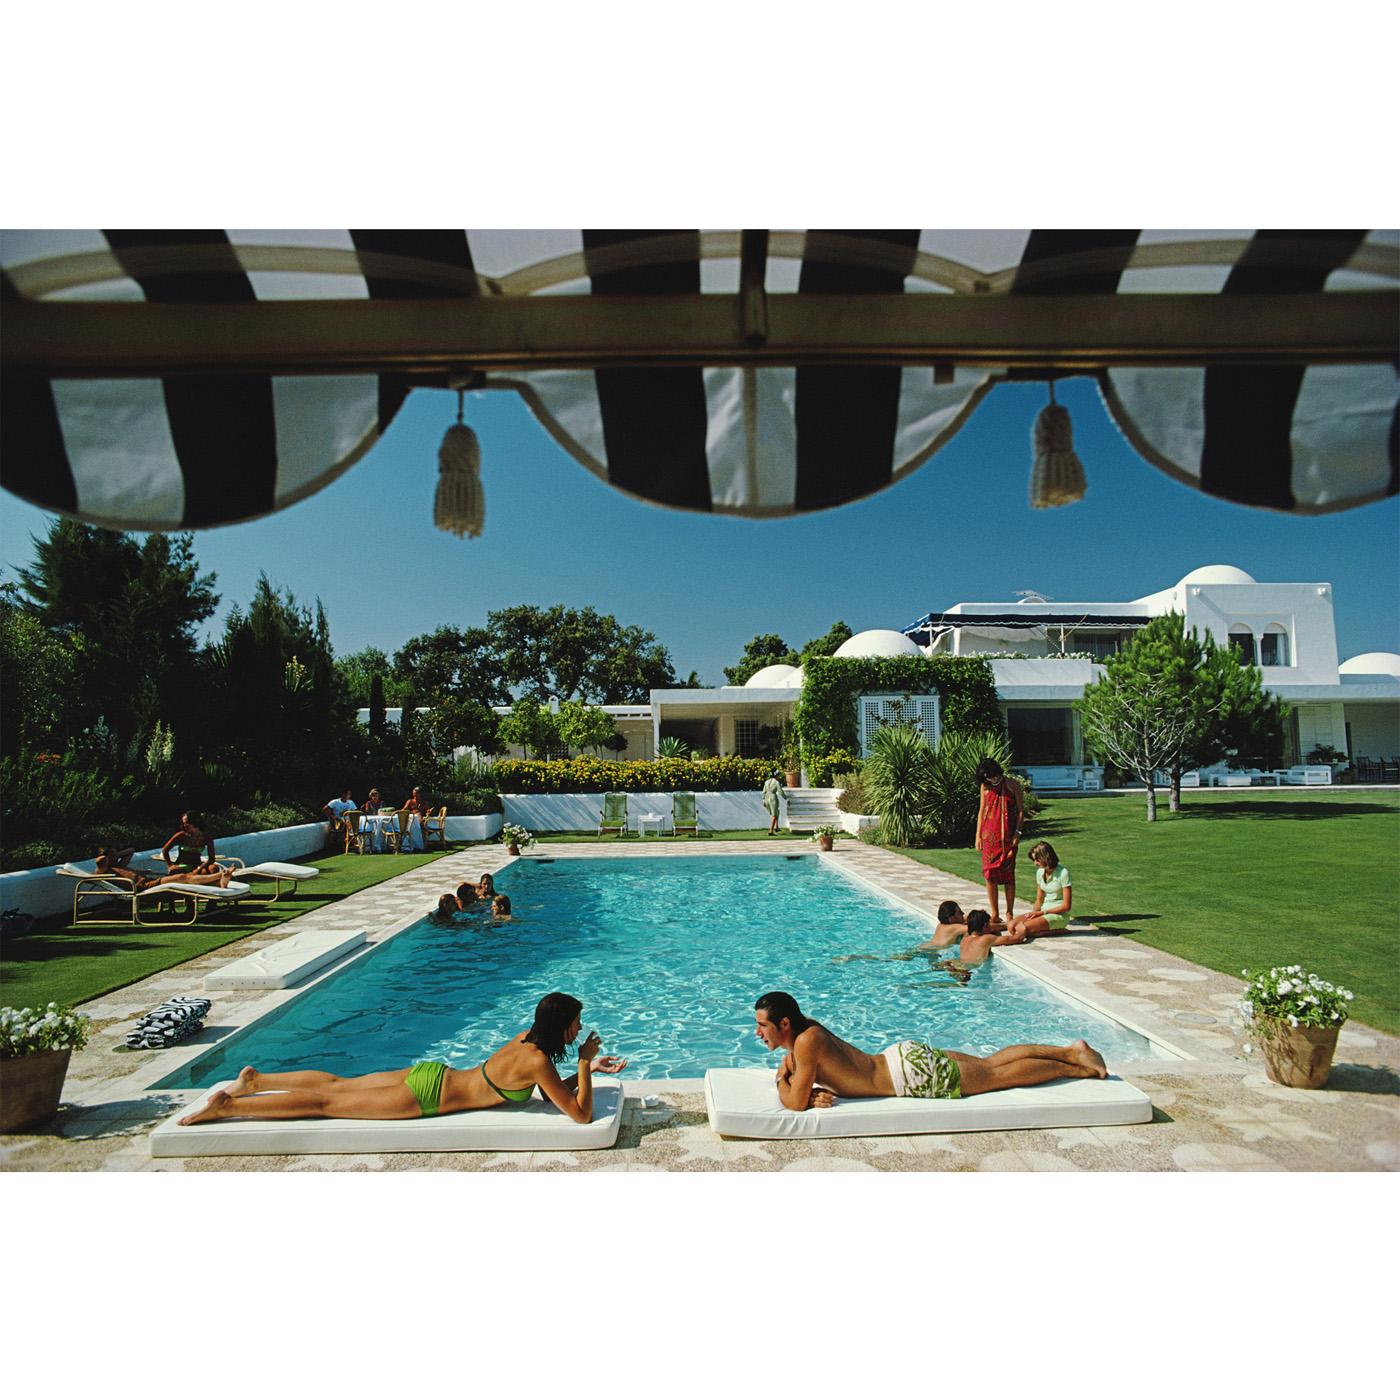 """Poolside in Sotogrande"""